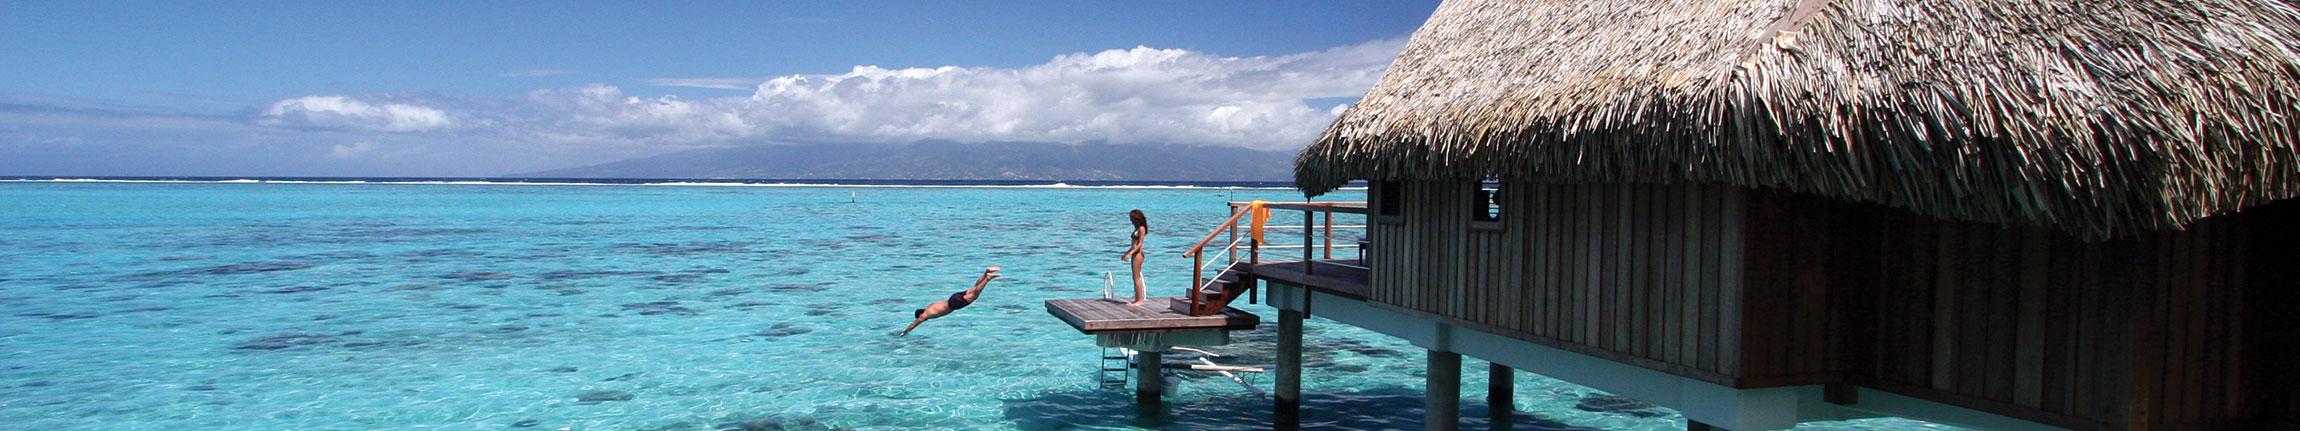 tahiti ses iles les incontournables e tahiti travel. Black Bedroom Furniture Sets. Home Design Ideas